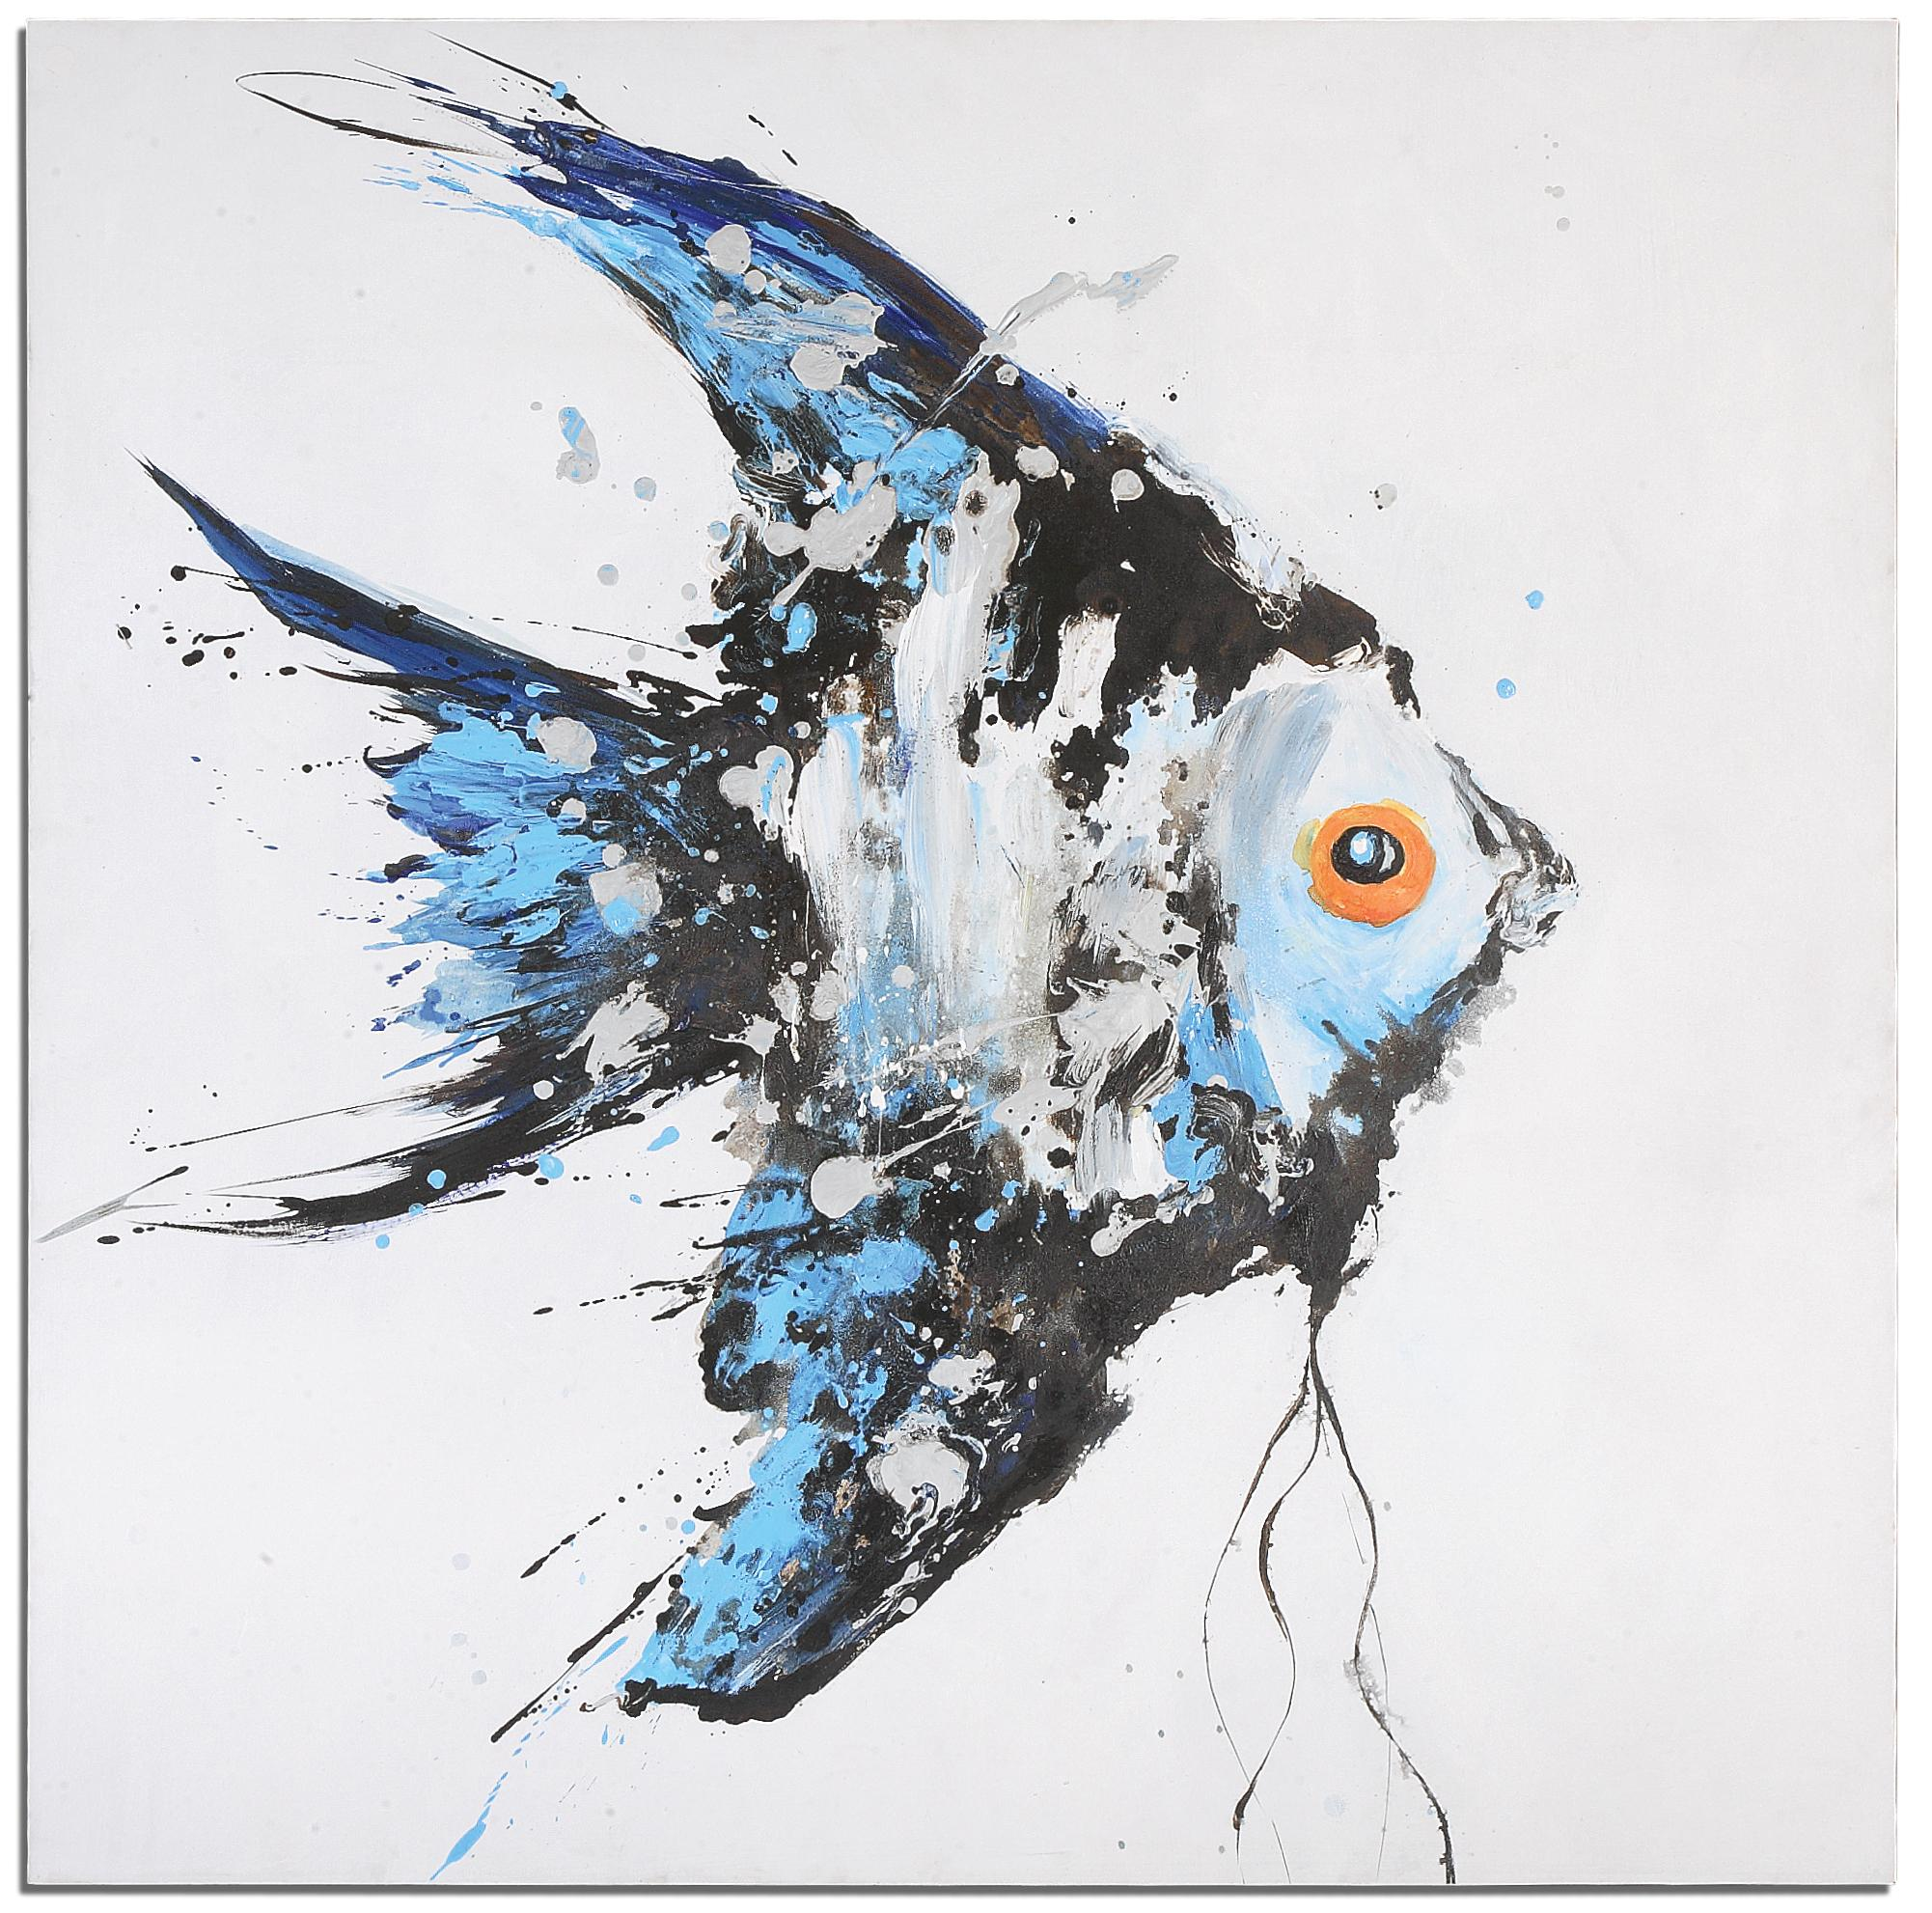 Art Blue Angel by Unique at Walker's Furniture